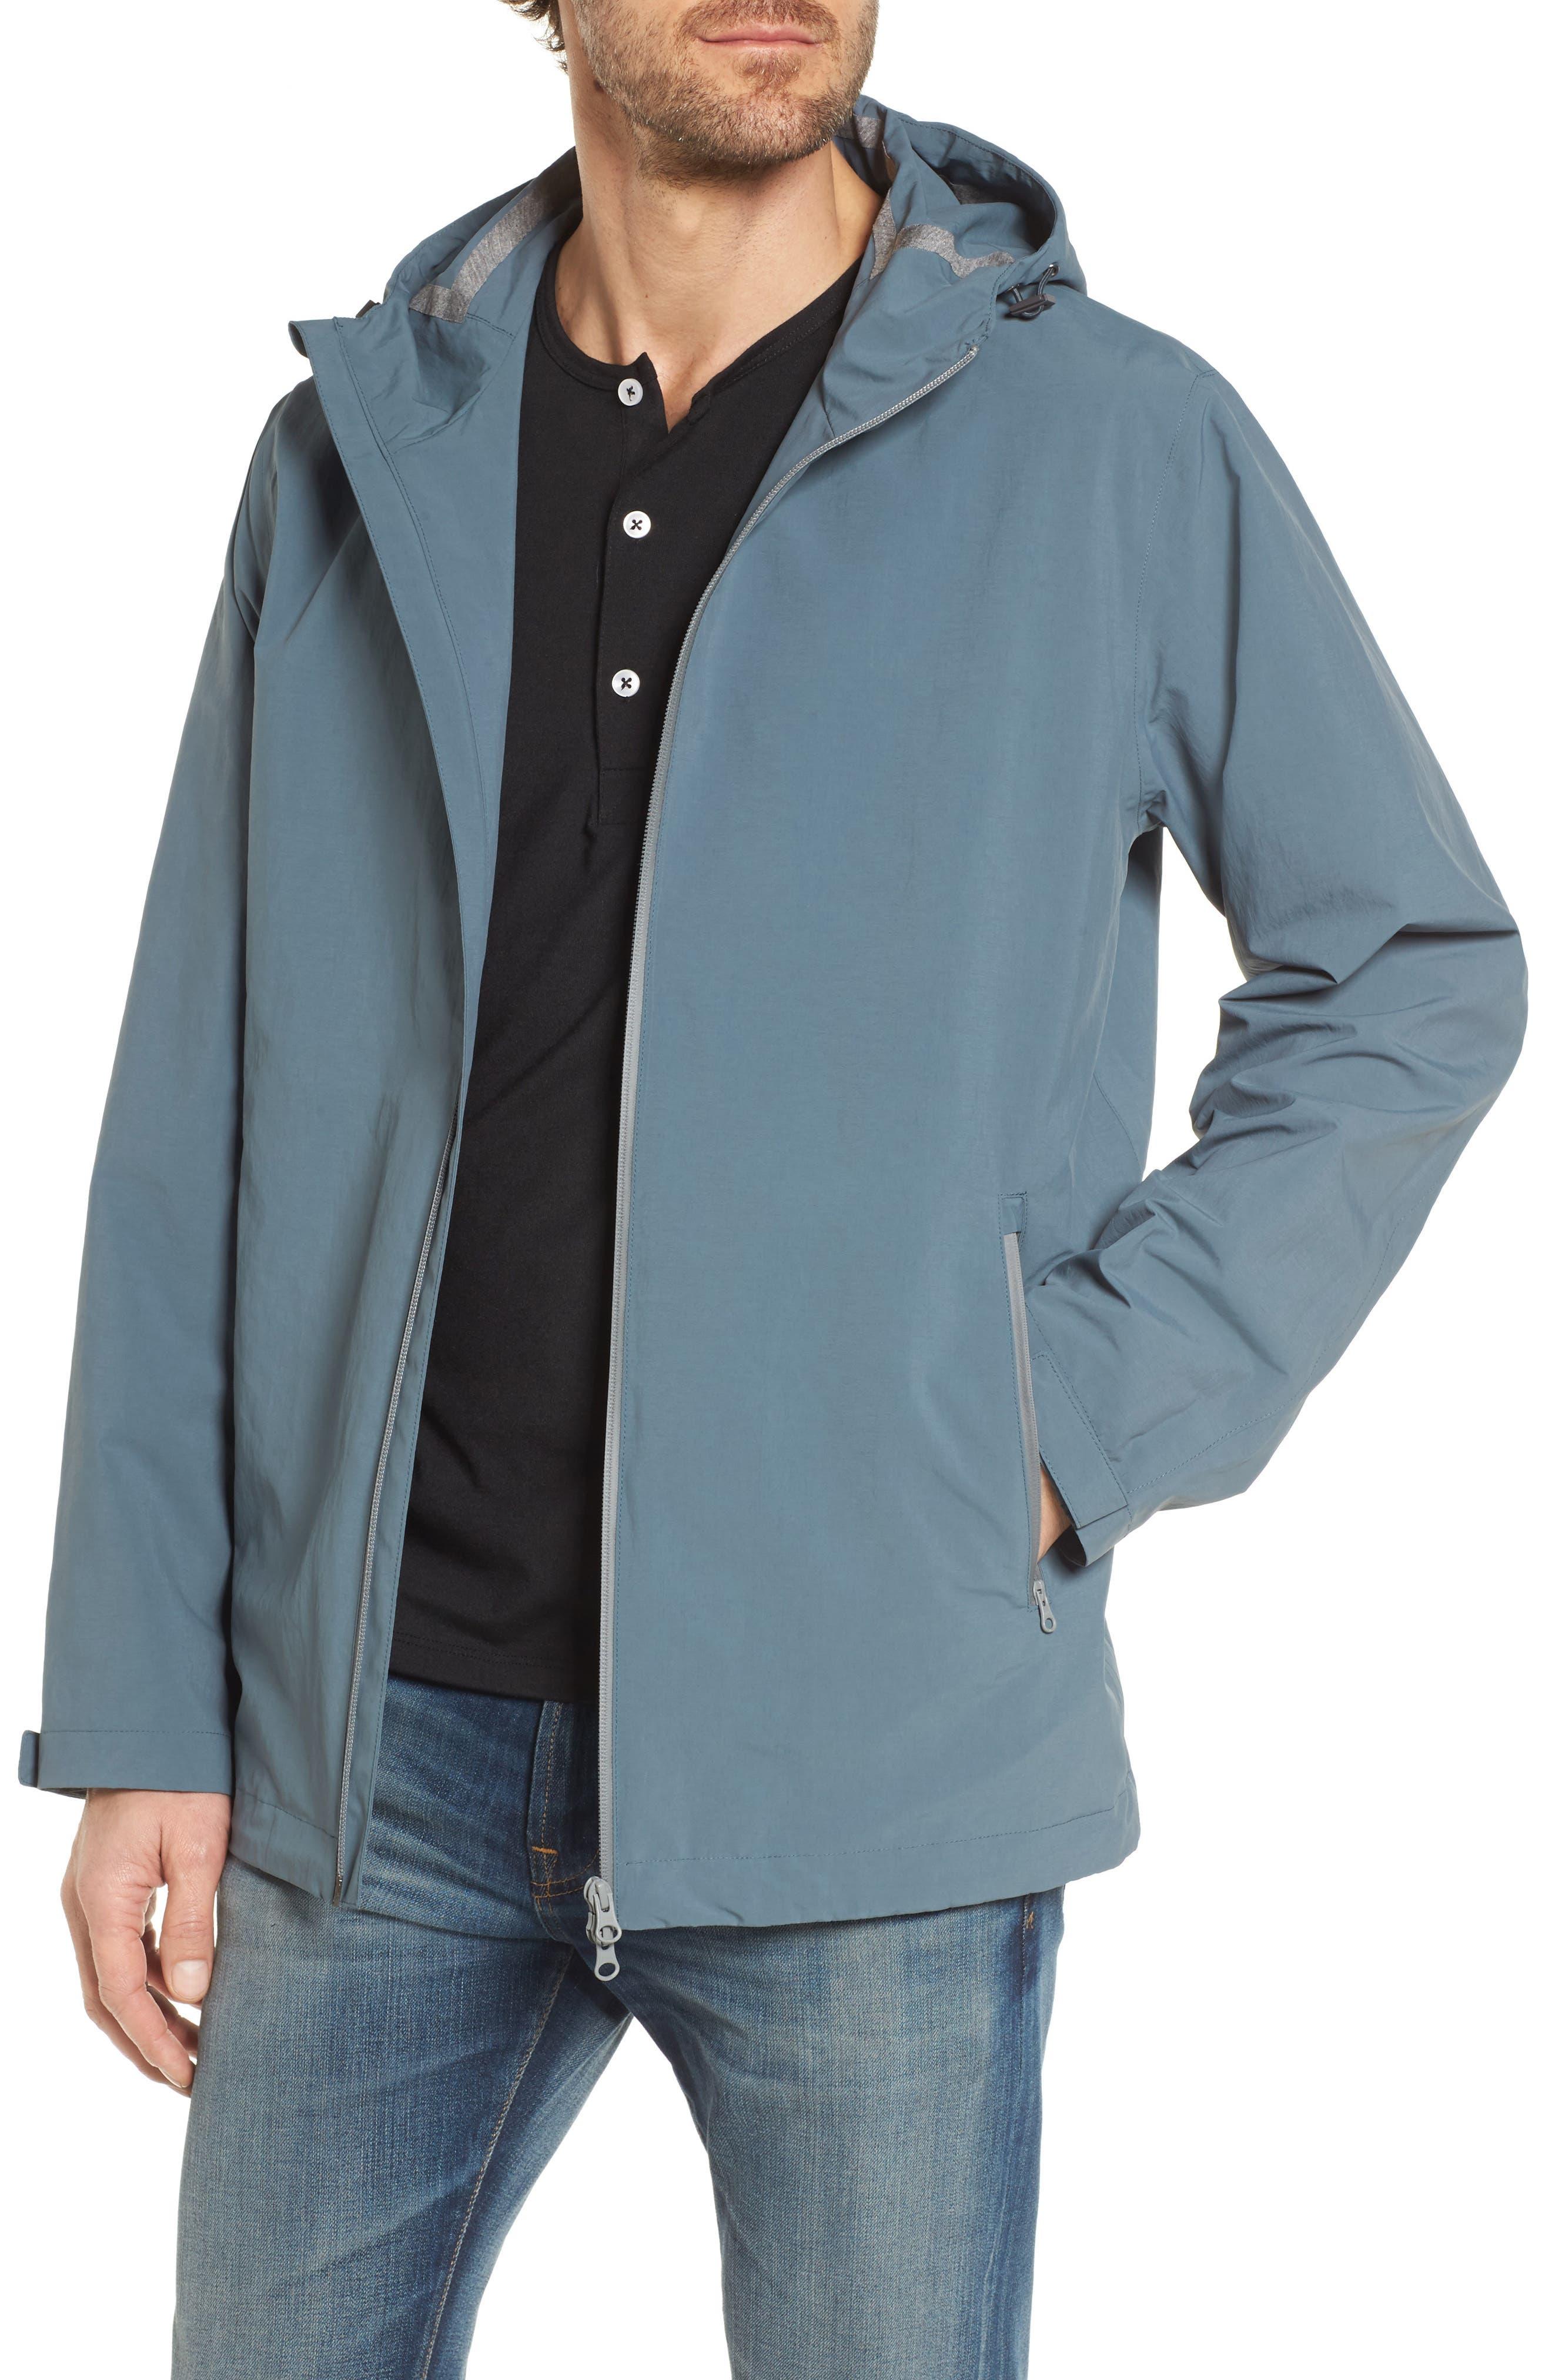 Plaster Hooded Raincoat,                         Main,                         color, Blue/ Grey